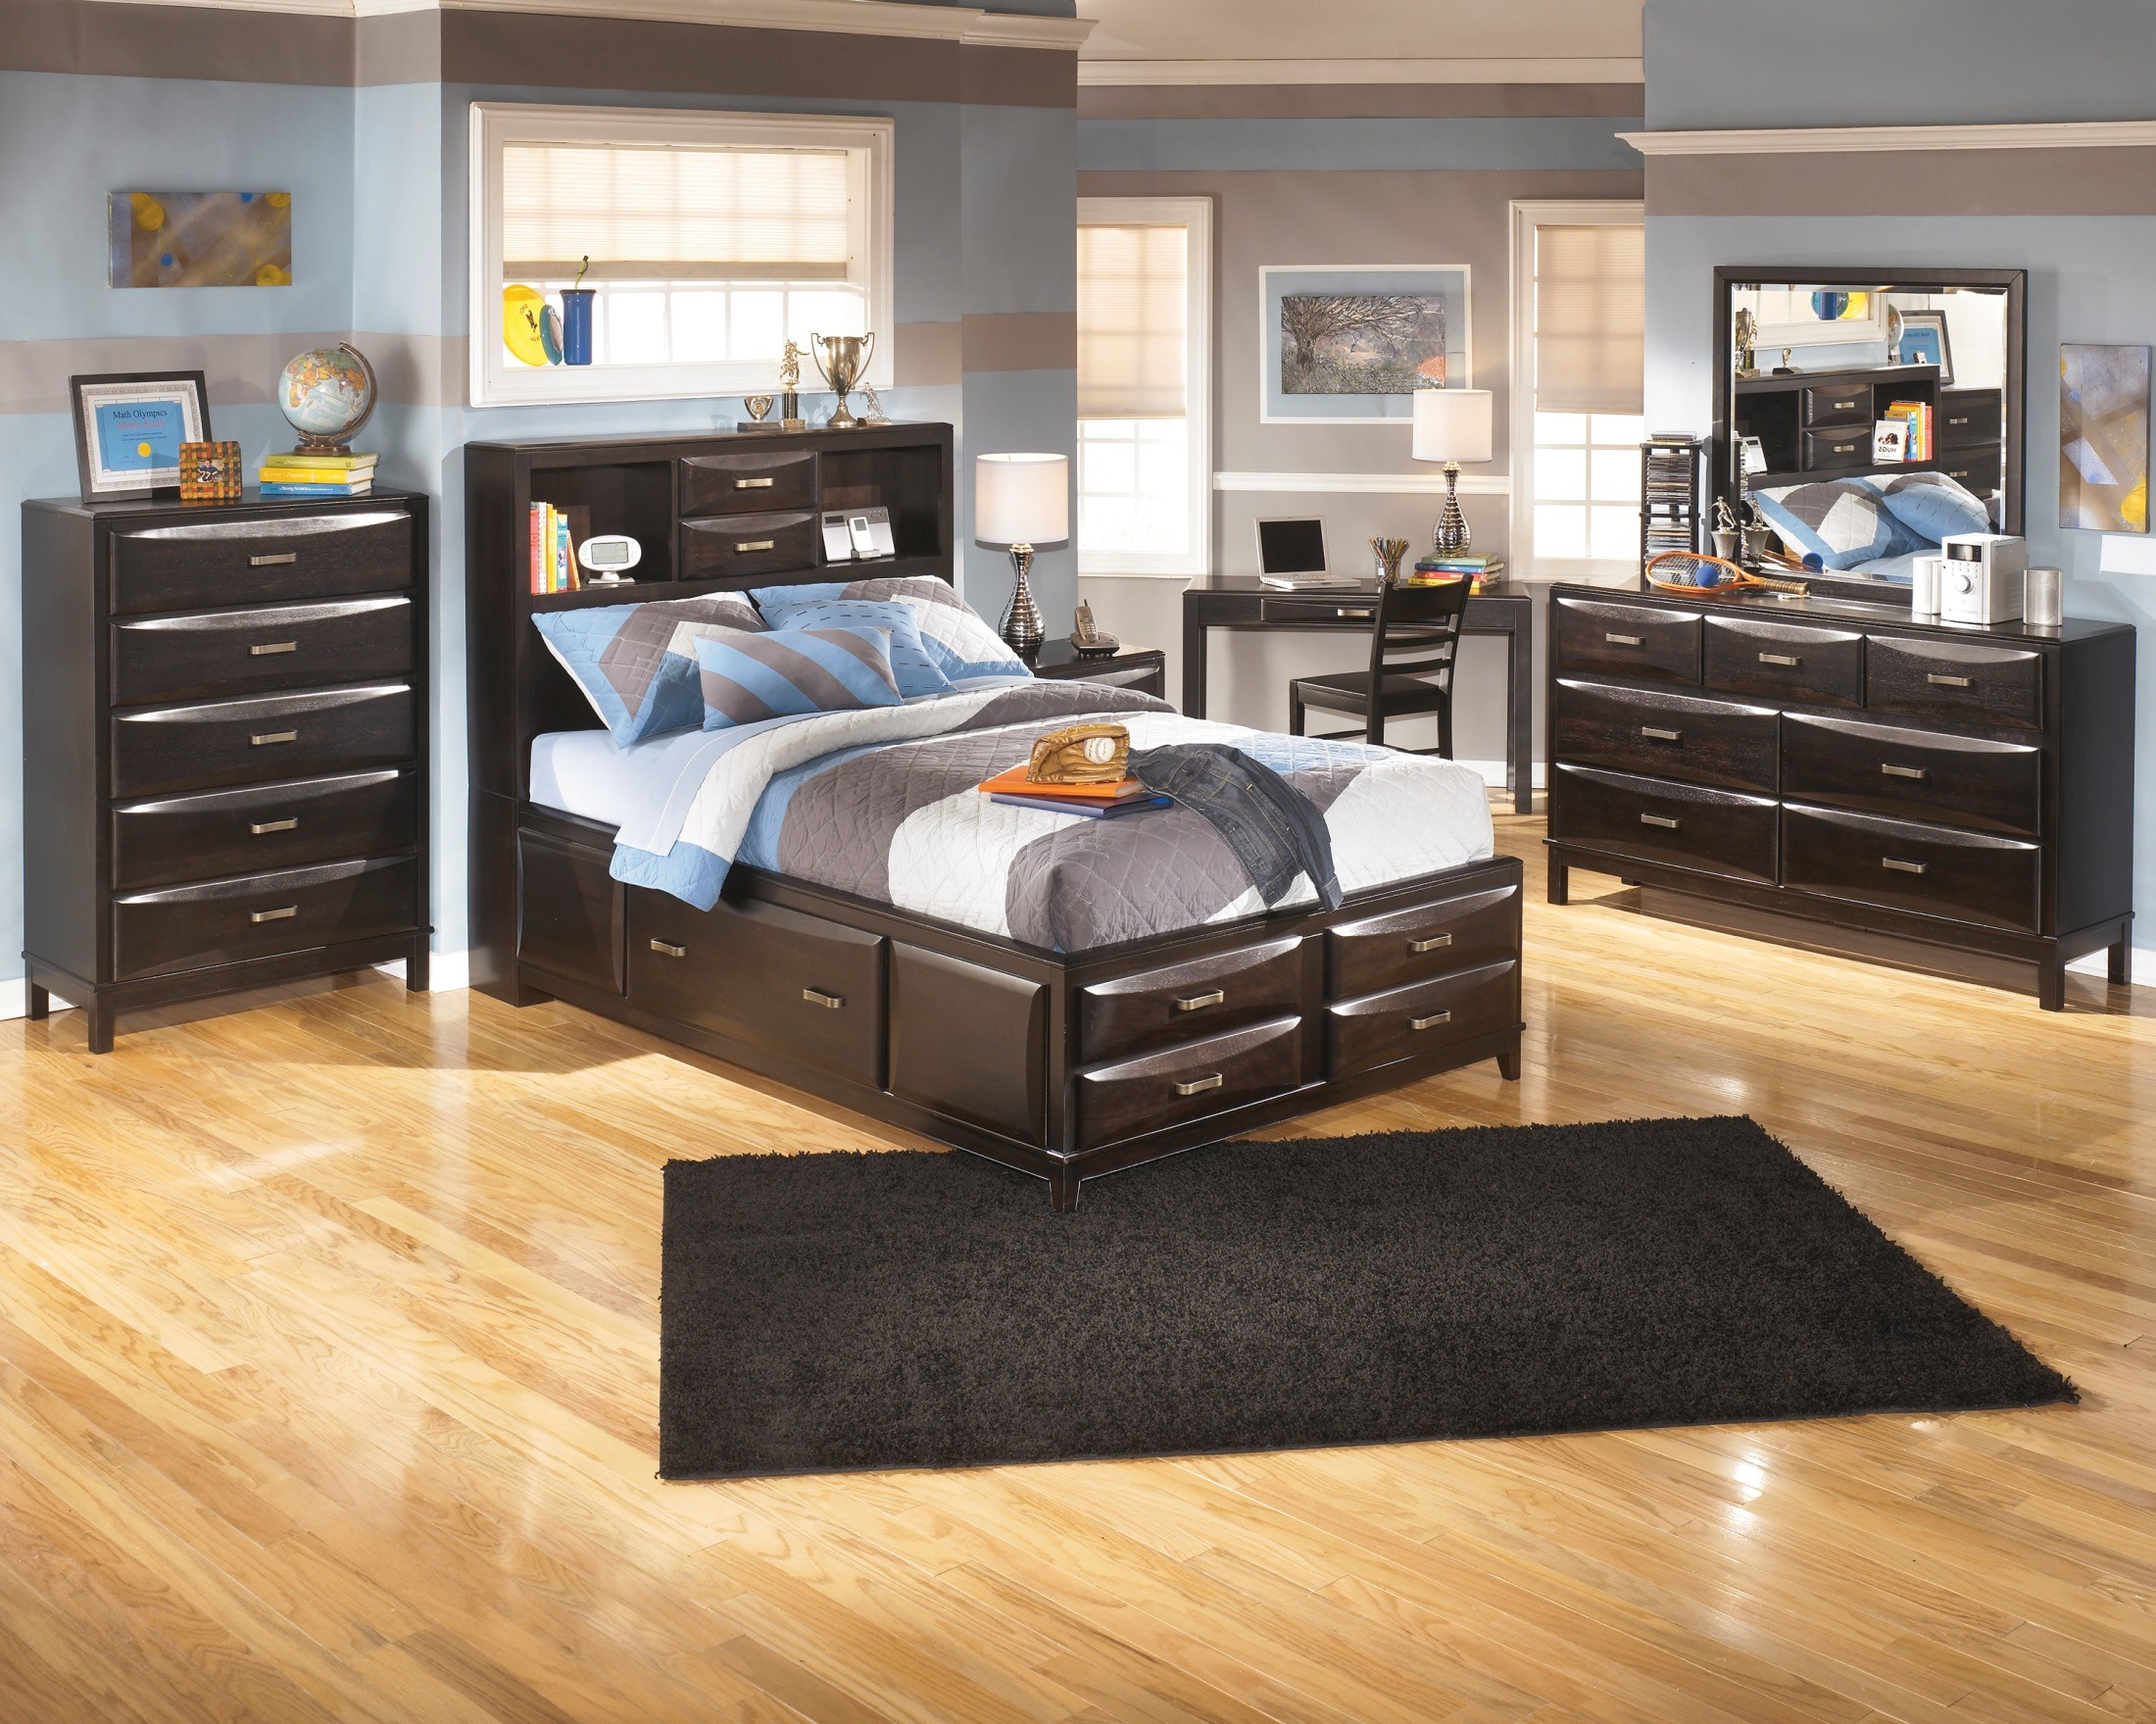 kira youth storage bedroom set from ashley b473